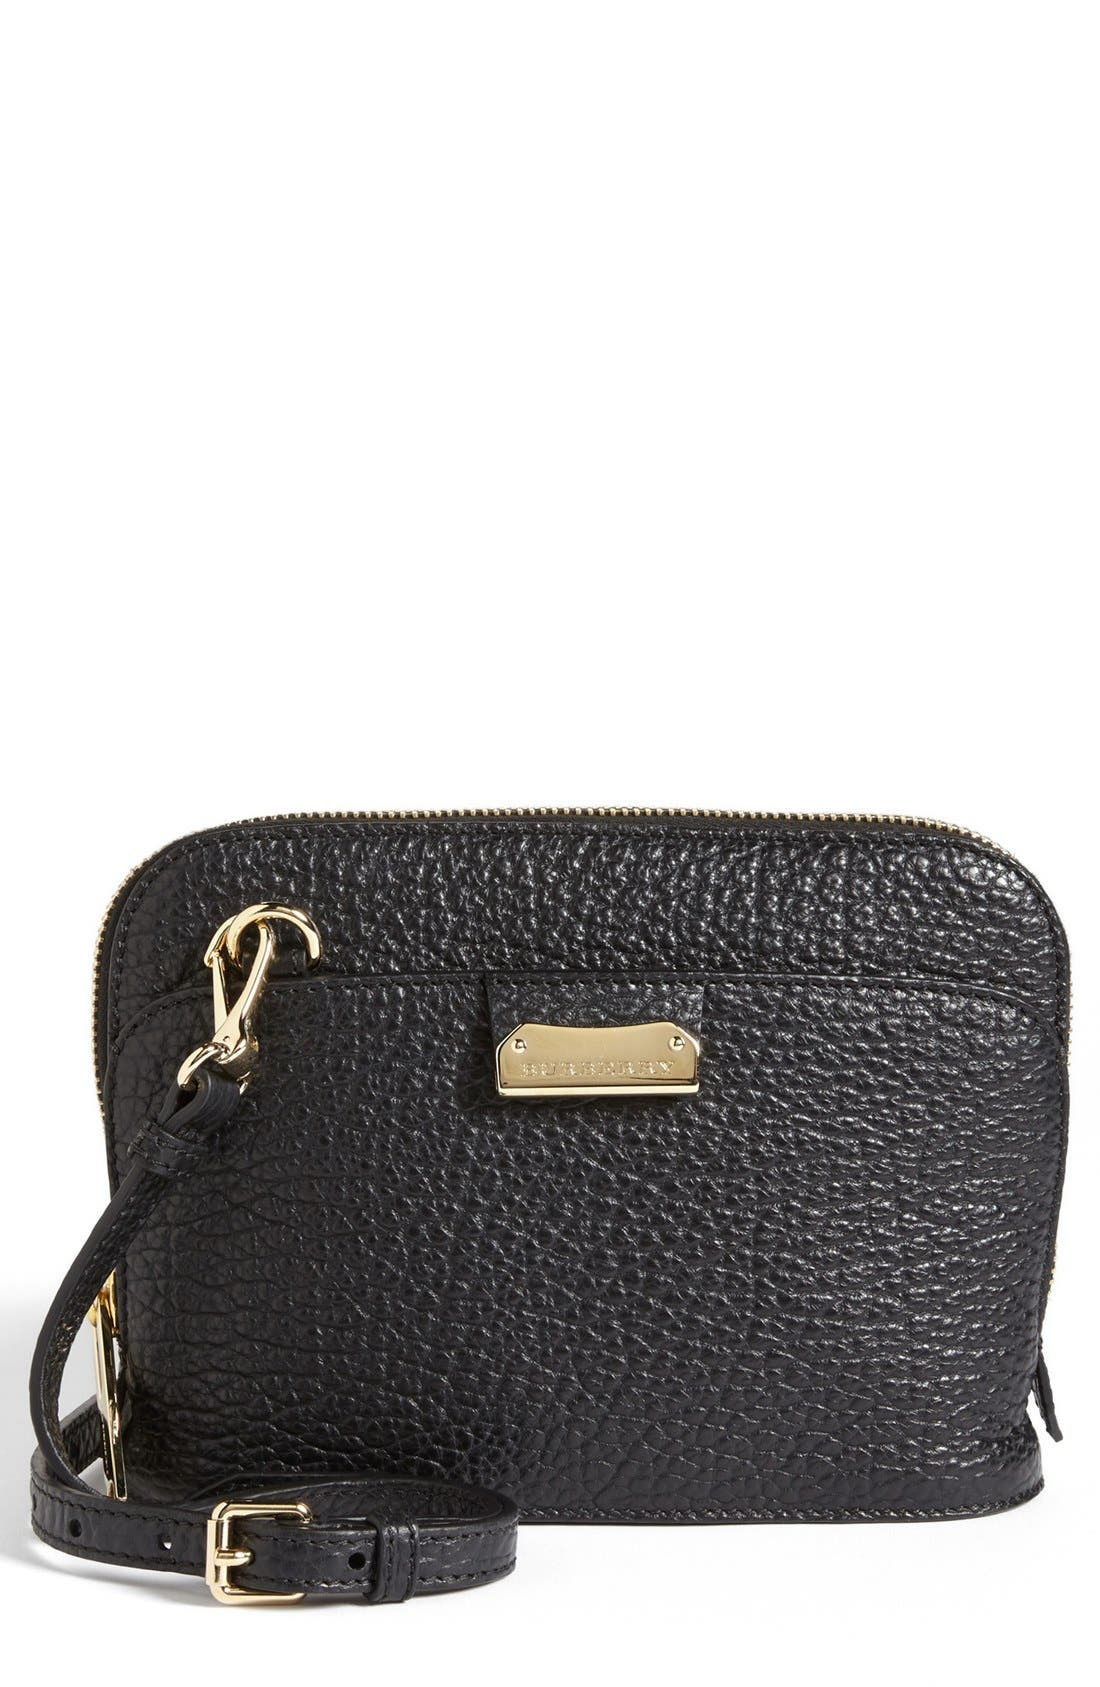 Alternate Image 1 Selected - Burberry 'Small Harrogate' Leather Crossbody Bag